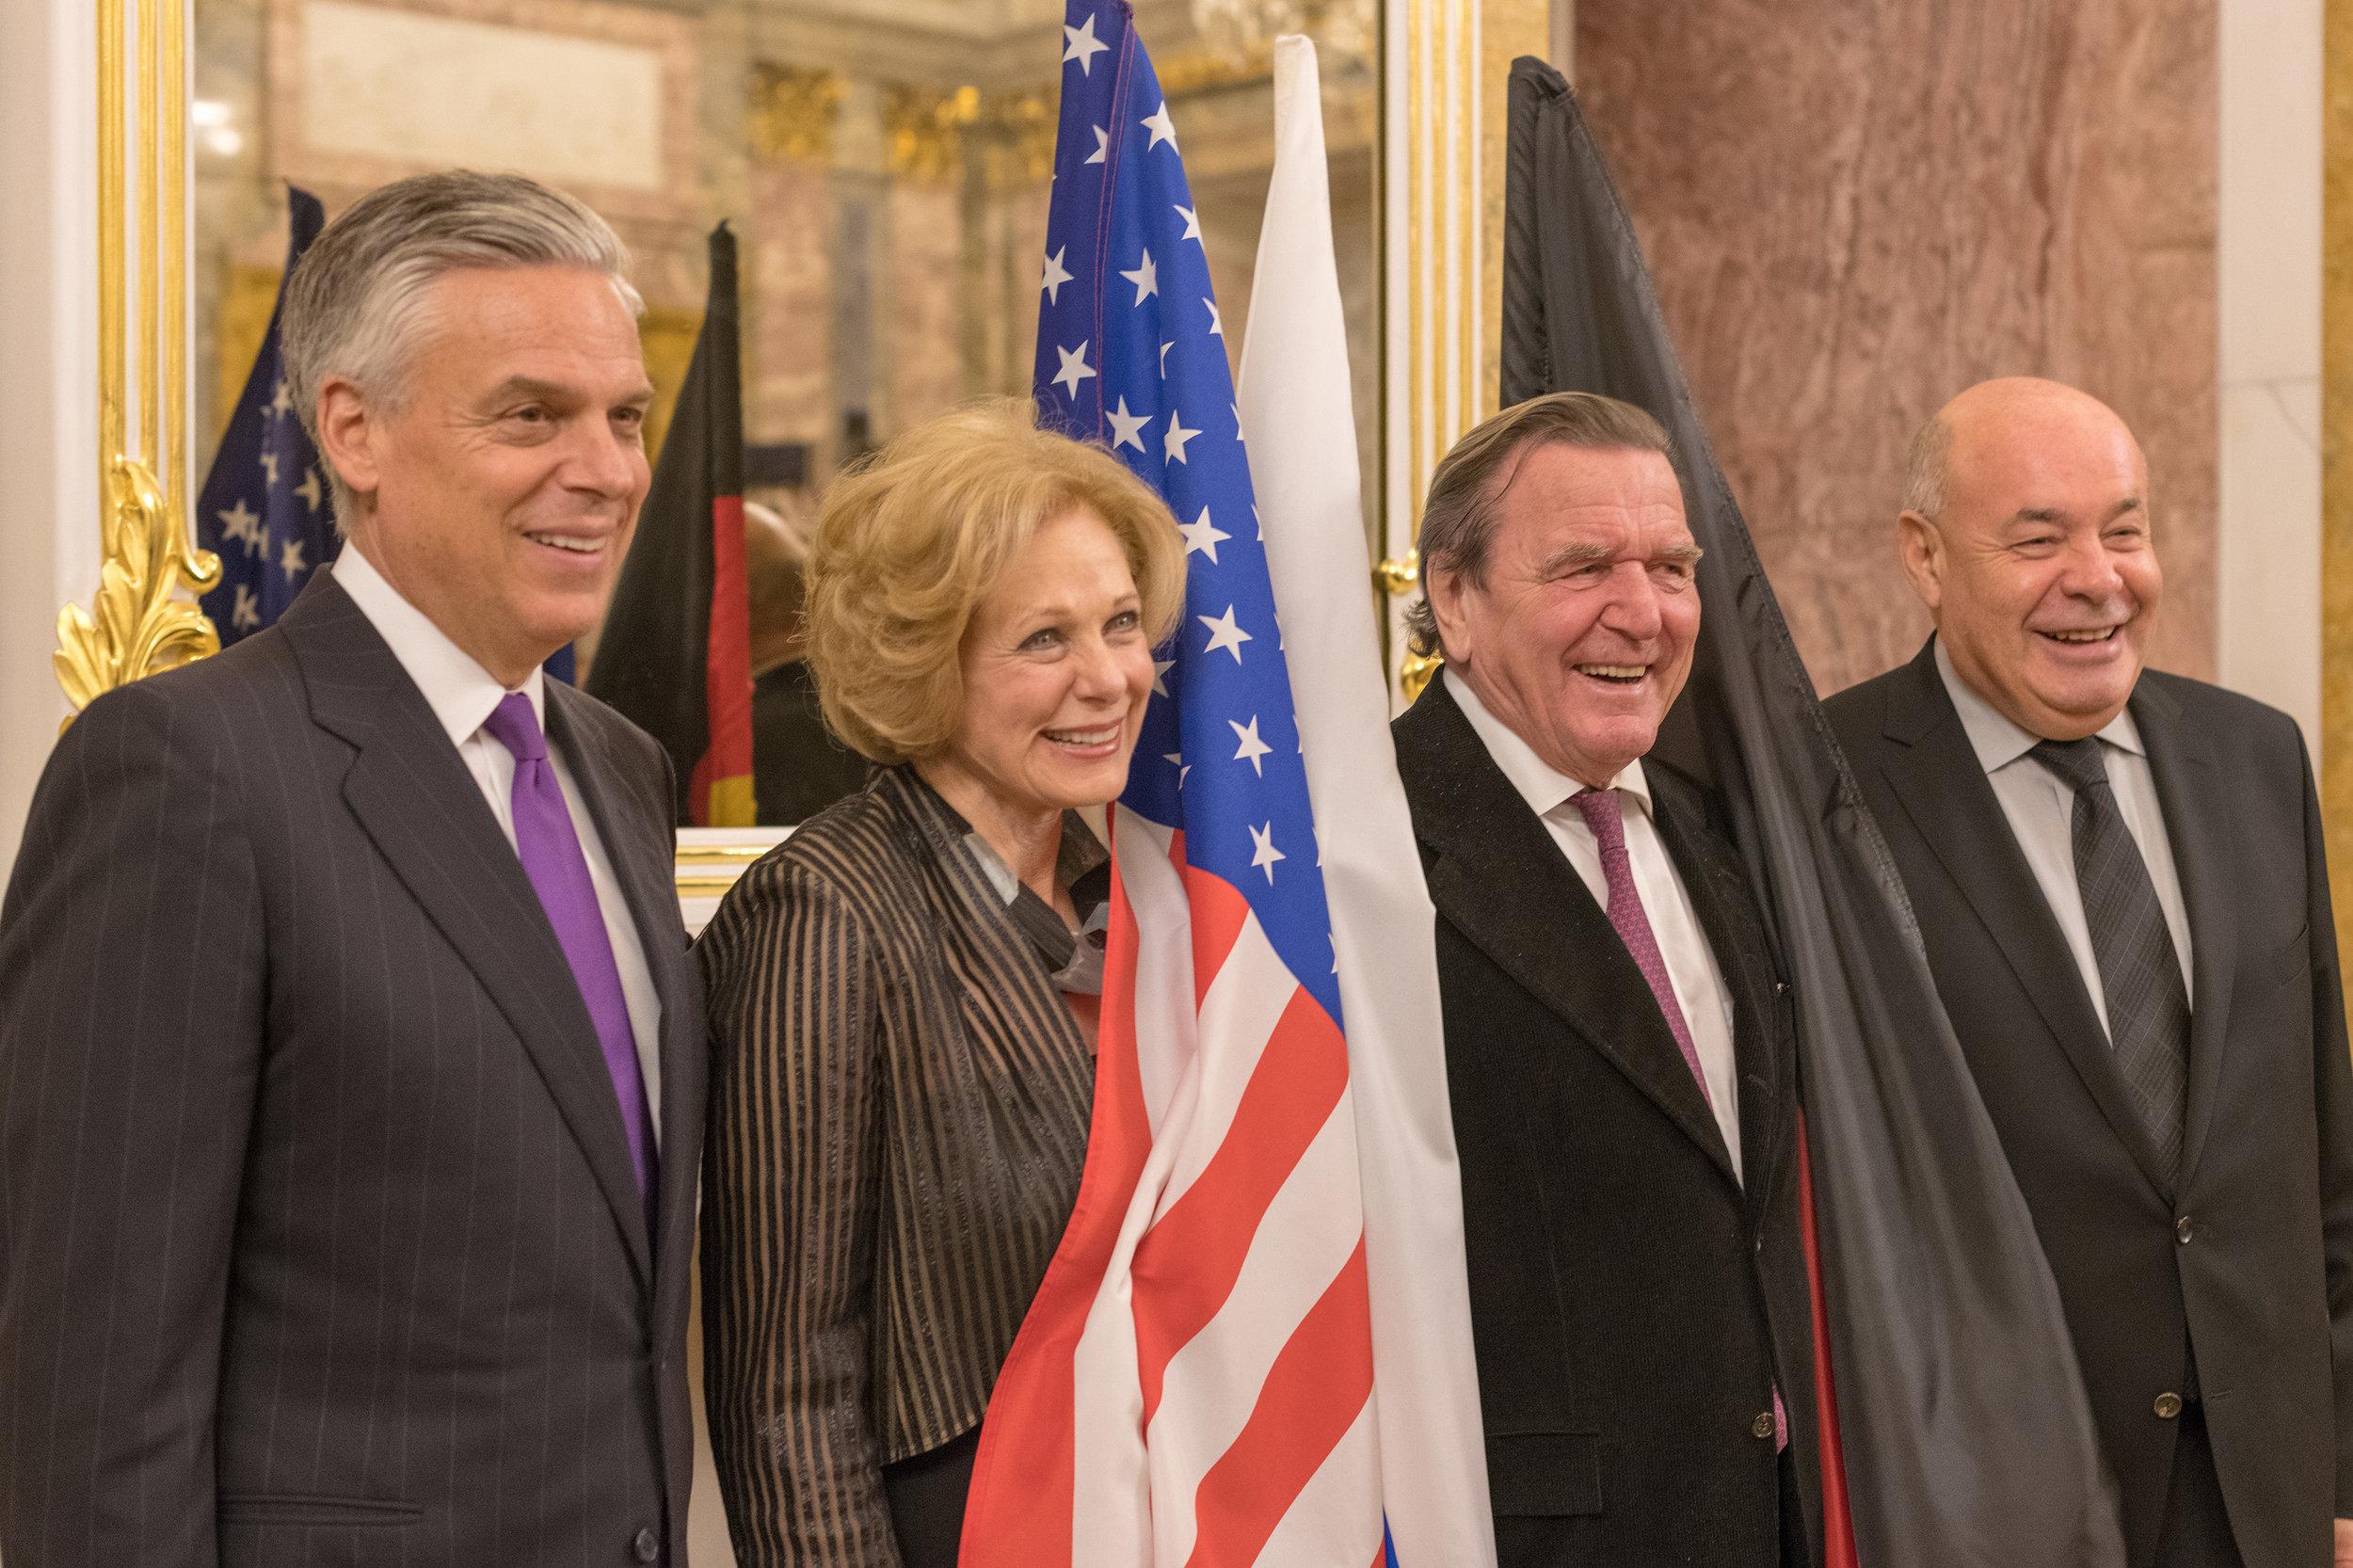 Ambassador Jon Huntsman; Susan Swartz;former Chancellor of Germany Gerhard Schröder; Mikhail Shvydkoy